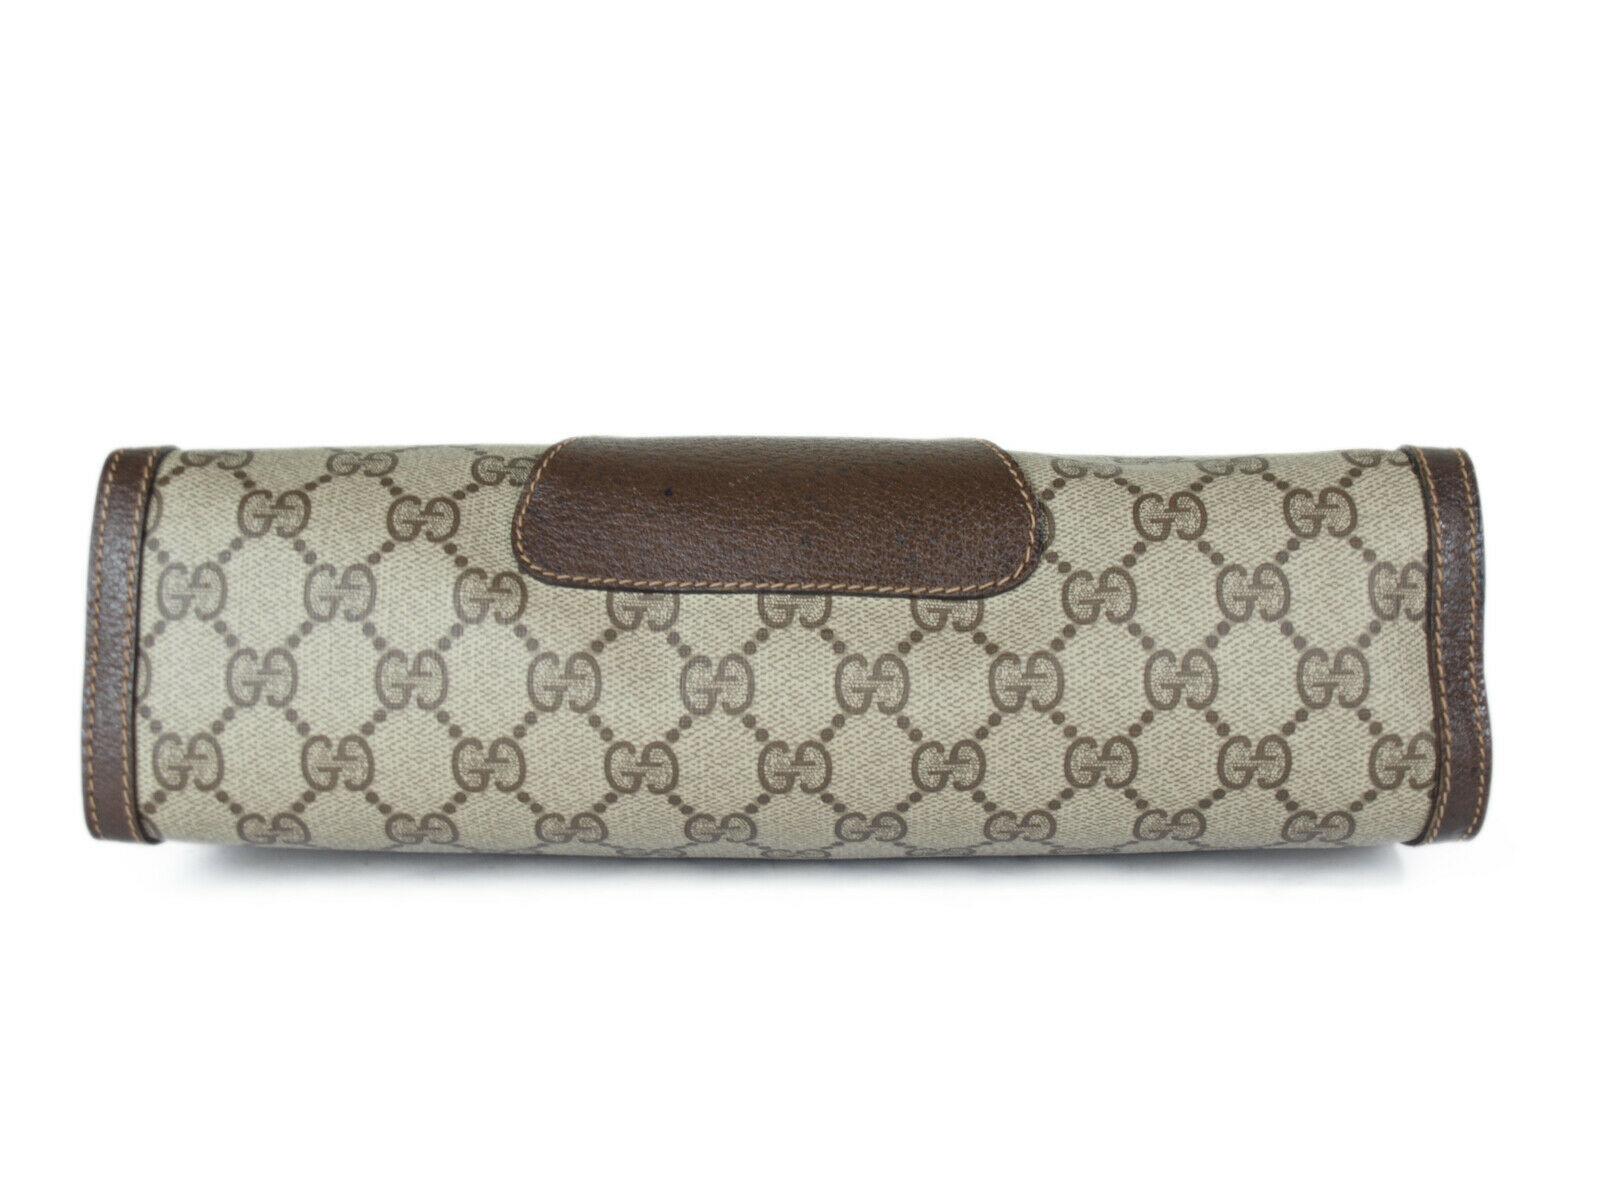 GUCCI GG Pattern PVC Canvas Leather Browns Clutch Bag GP2204